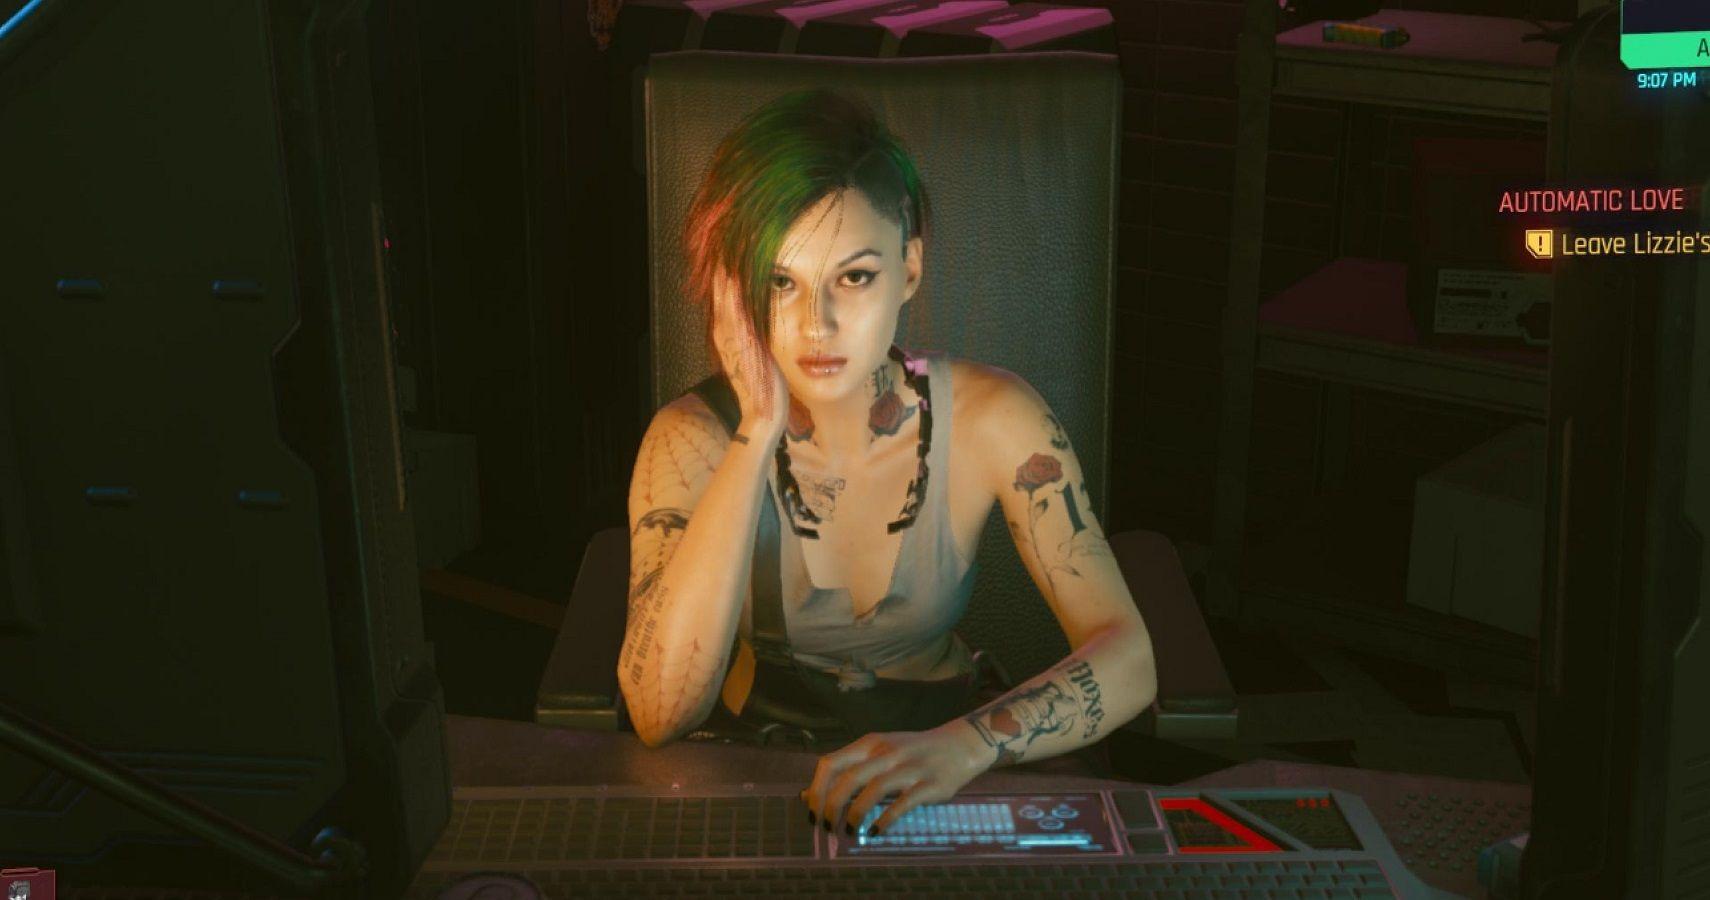 Judy Alvarez—Cyberpunk 2077